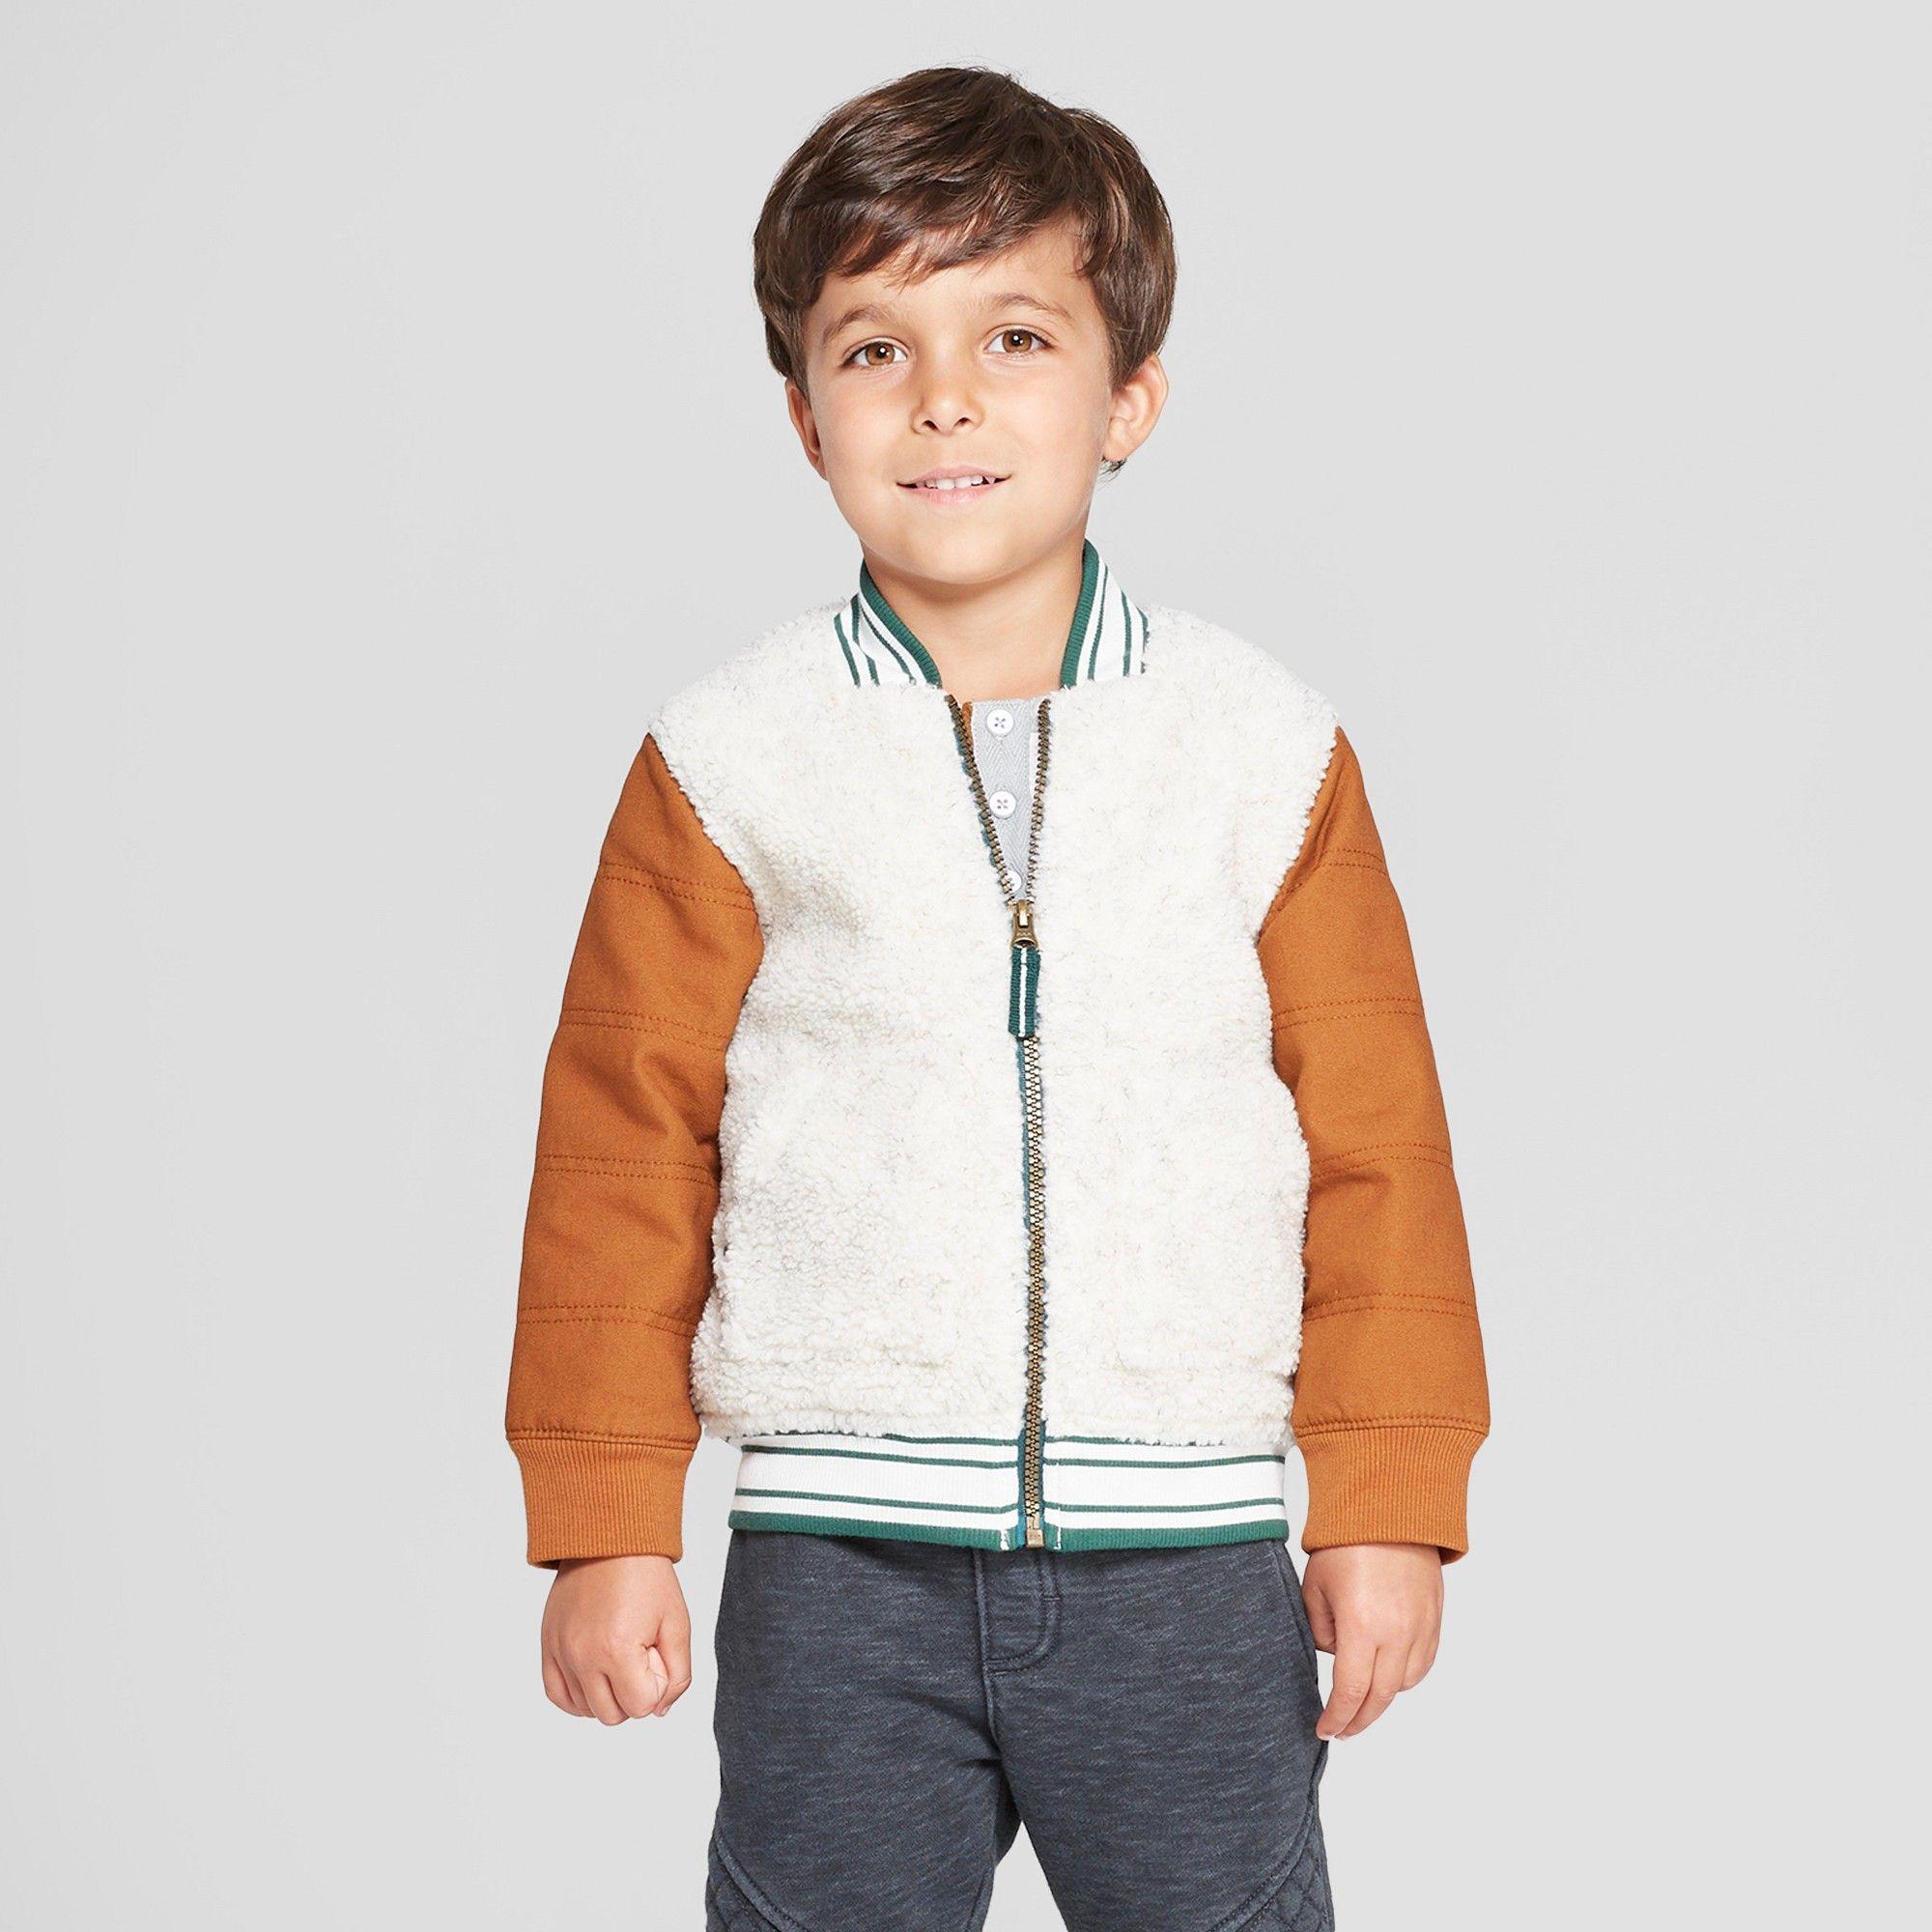 7b6c6ed81 Toddler Girls' Ombre Denim Jacket - Genuine Kids from OshKosh Blue 12M    Products   Girls denim jacket, Toddler girl, Baby & toddler clothing